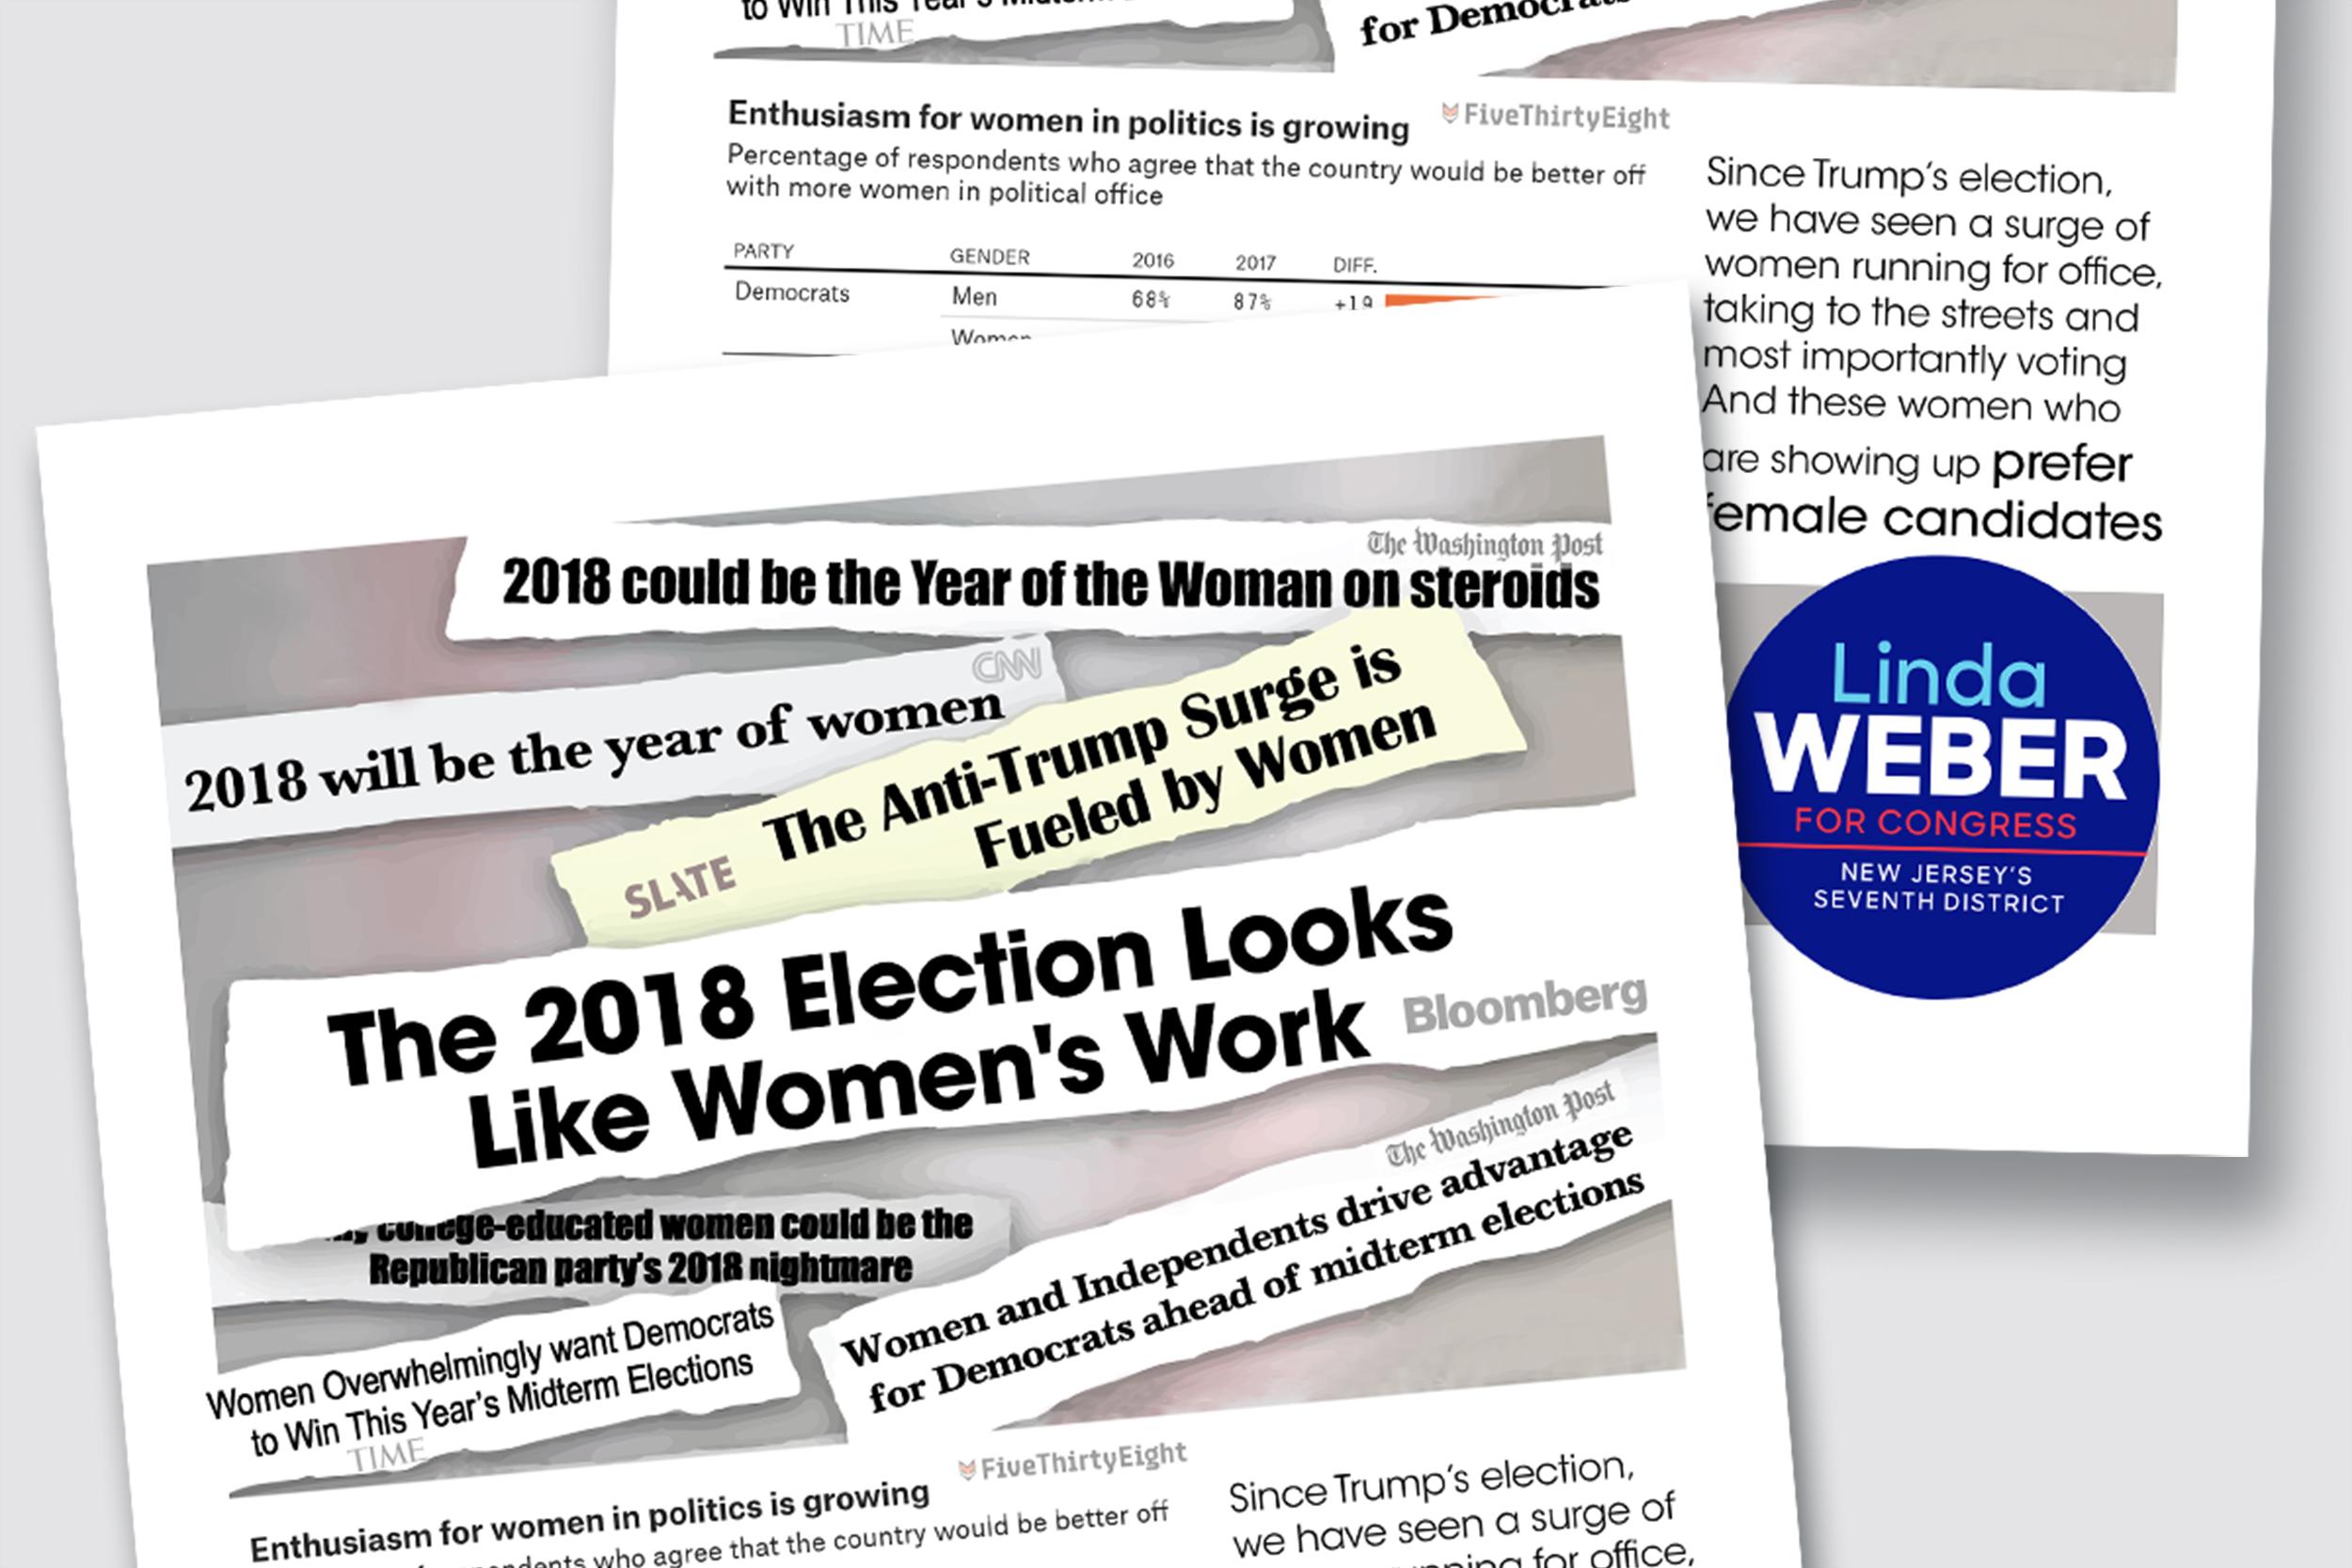 Linda Weber for Congress